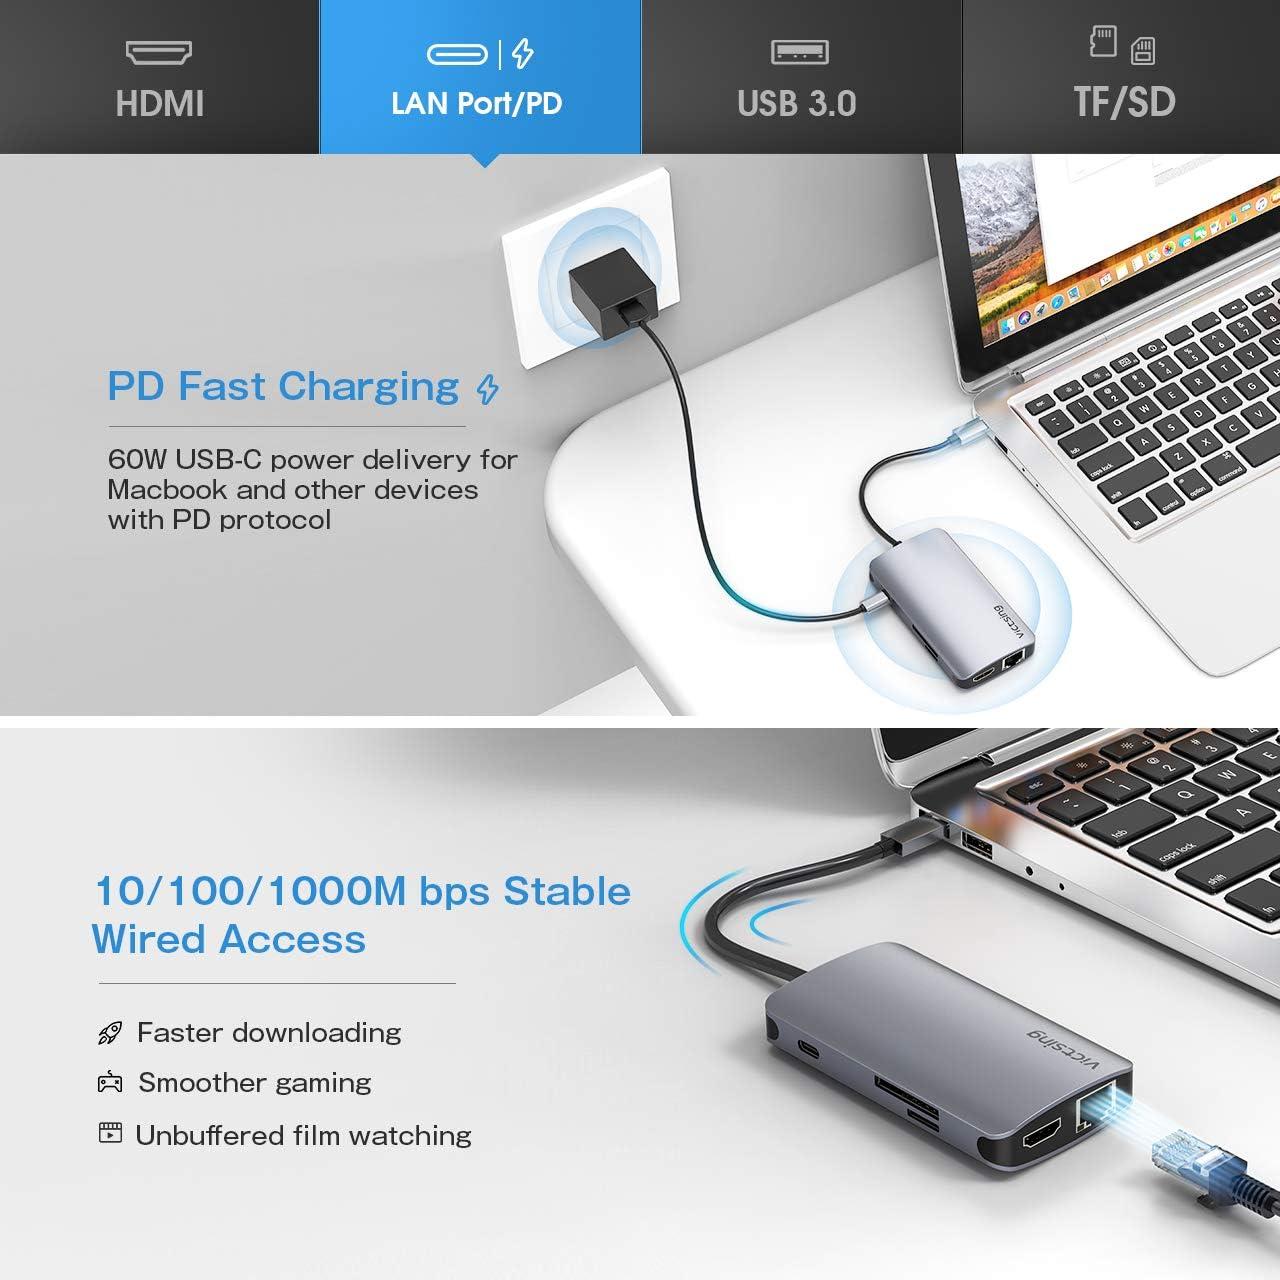 Dell XPS USB C Hub Lenovo ASUS 3 USB 3.0 Ports VicTsing 8-in-1 Type C Hub with Gigabit Ethernet SD//TF Card Reader 4K HDMI Chromebook USB C Charging for MacBook Pro